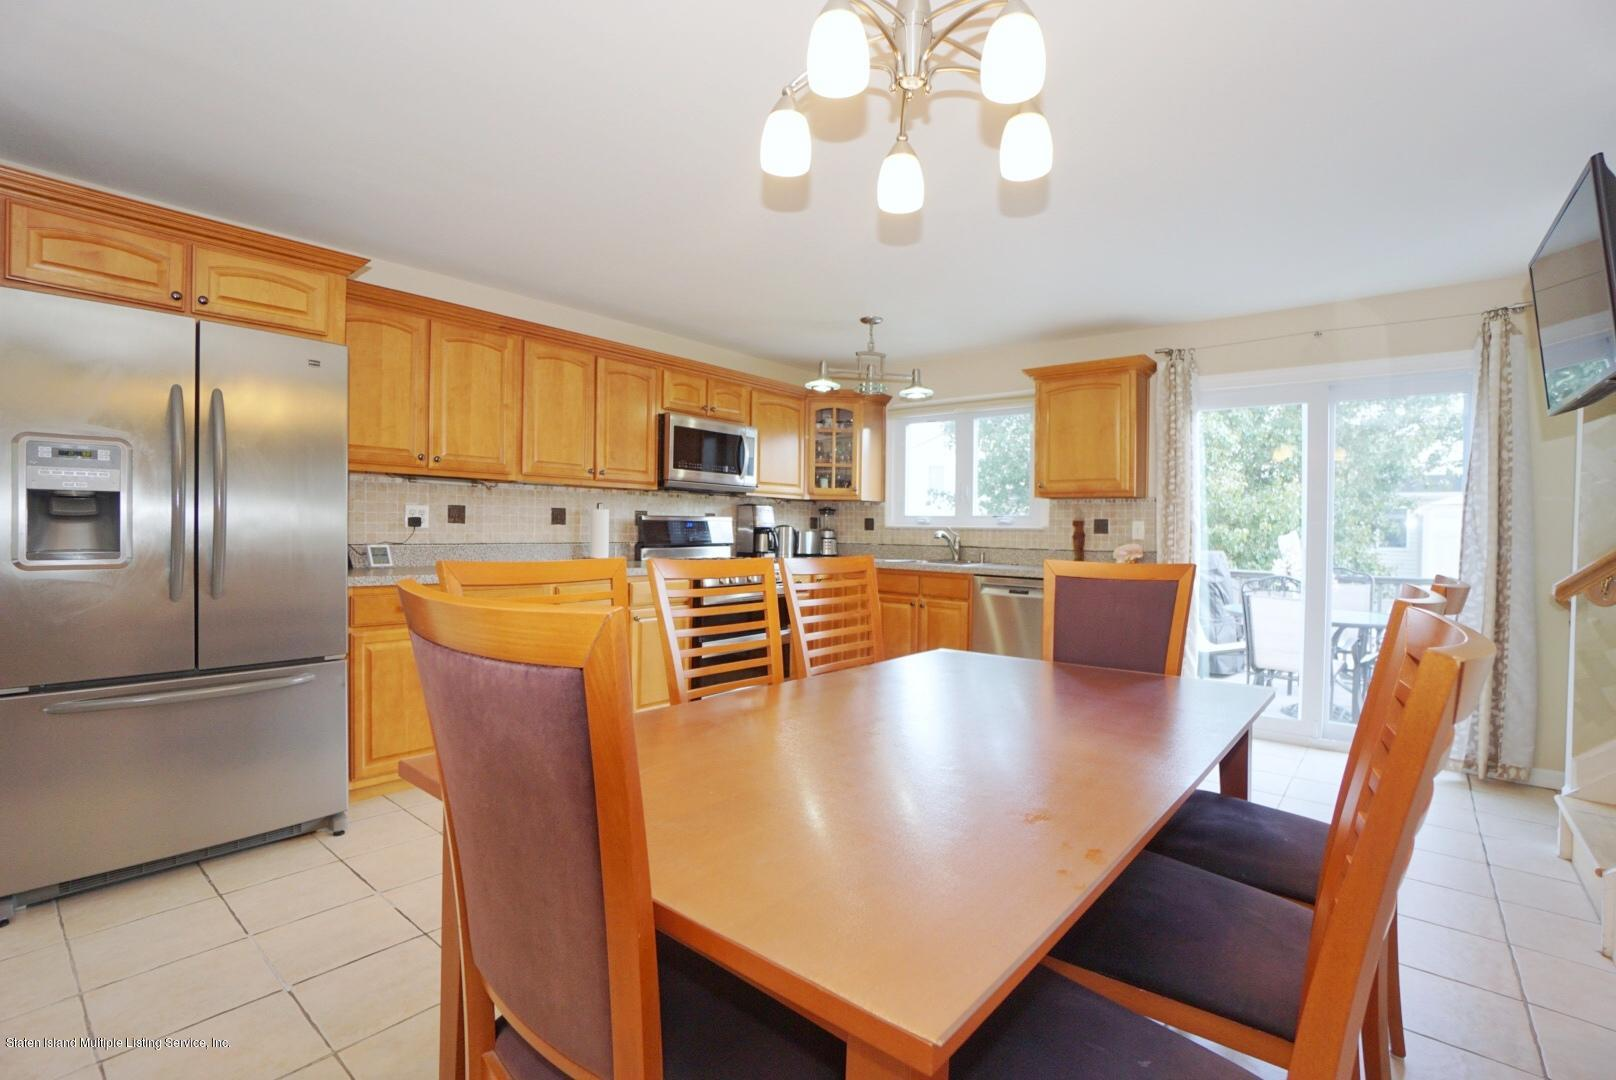 Single Family - Semi-Attached 18 Dunhill Lane  Staten Island, NY 10309, MLS-1139055-14